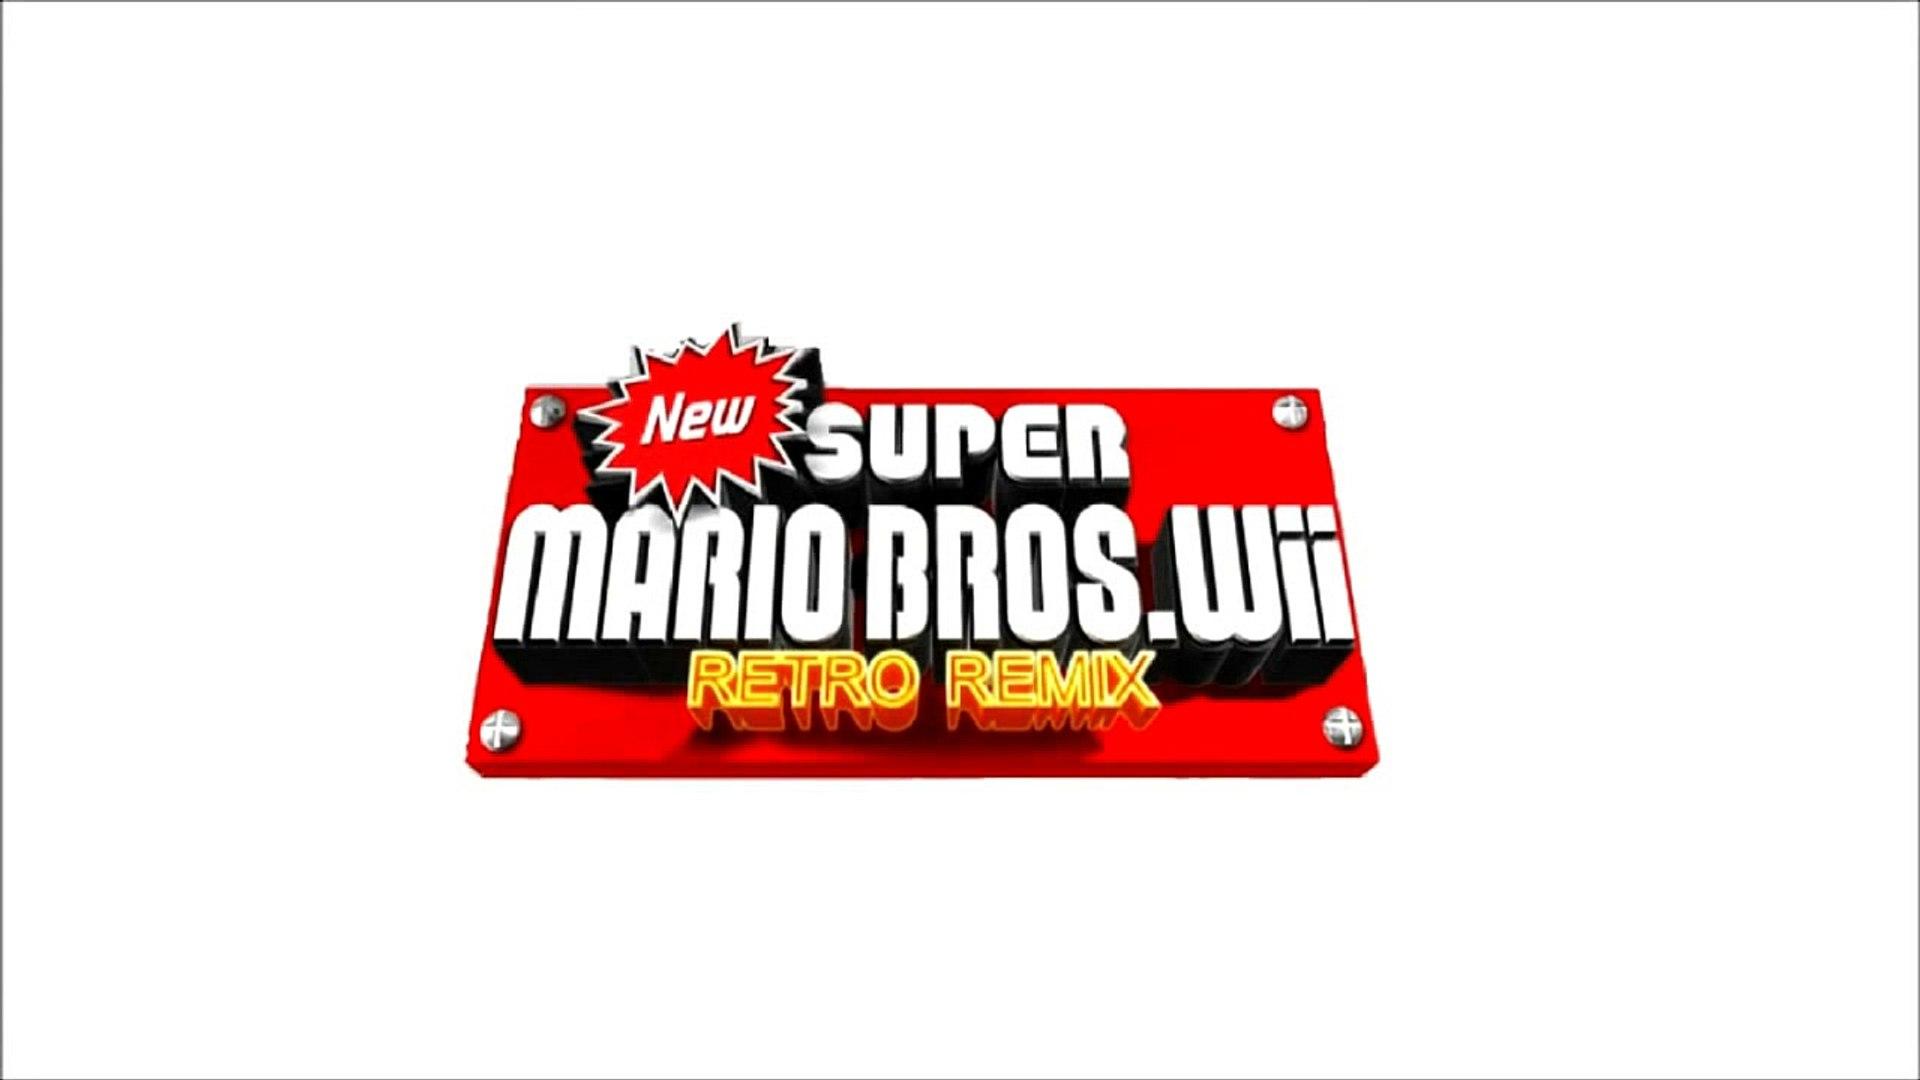 New Super Mario Bros Wii Retro Remix Soundtrack Unused